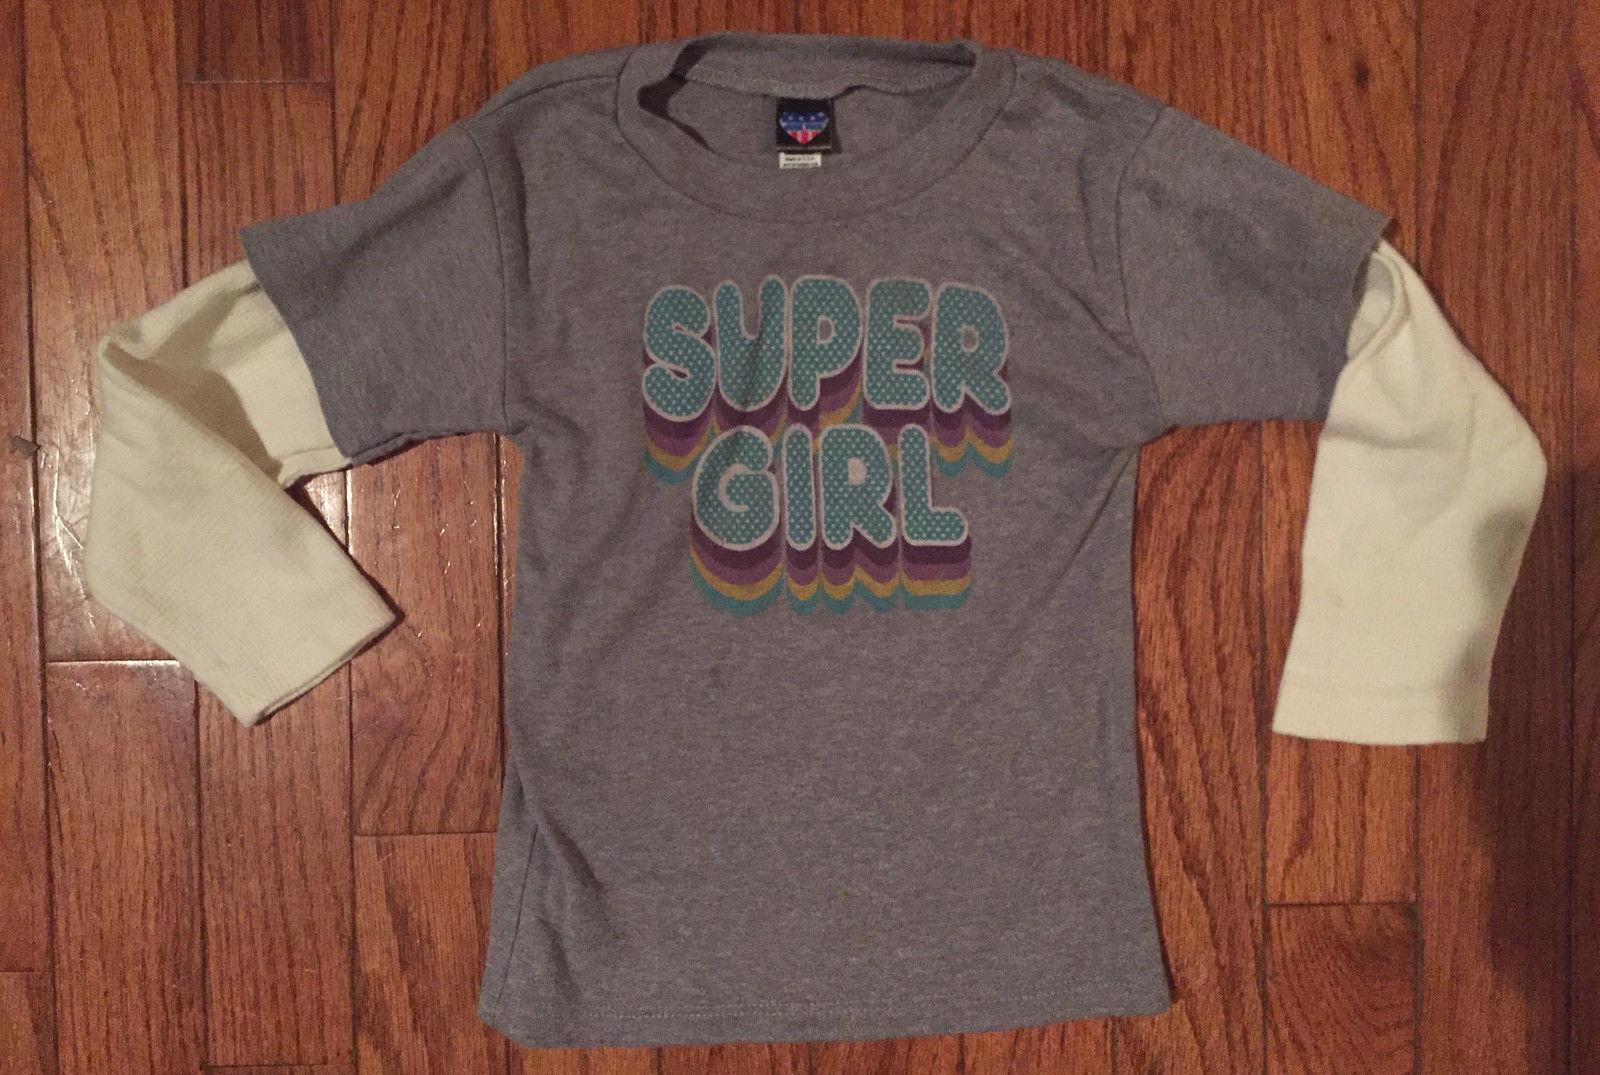 New Authentic Junk Food Jimi Hendrix Girls 2fer T-Shirt